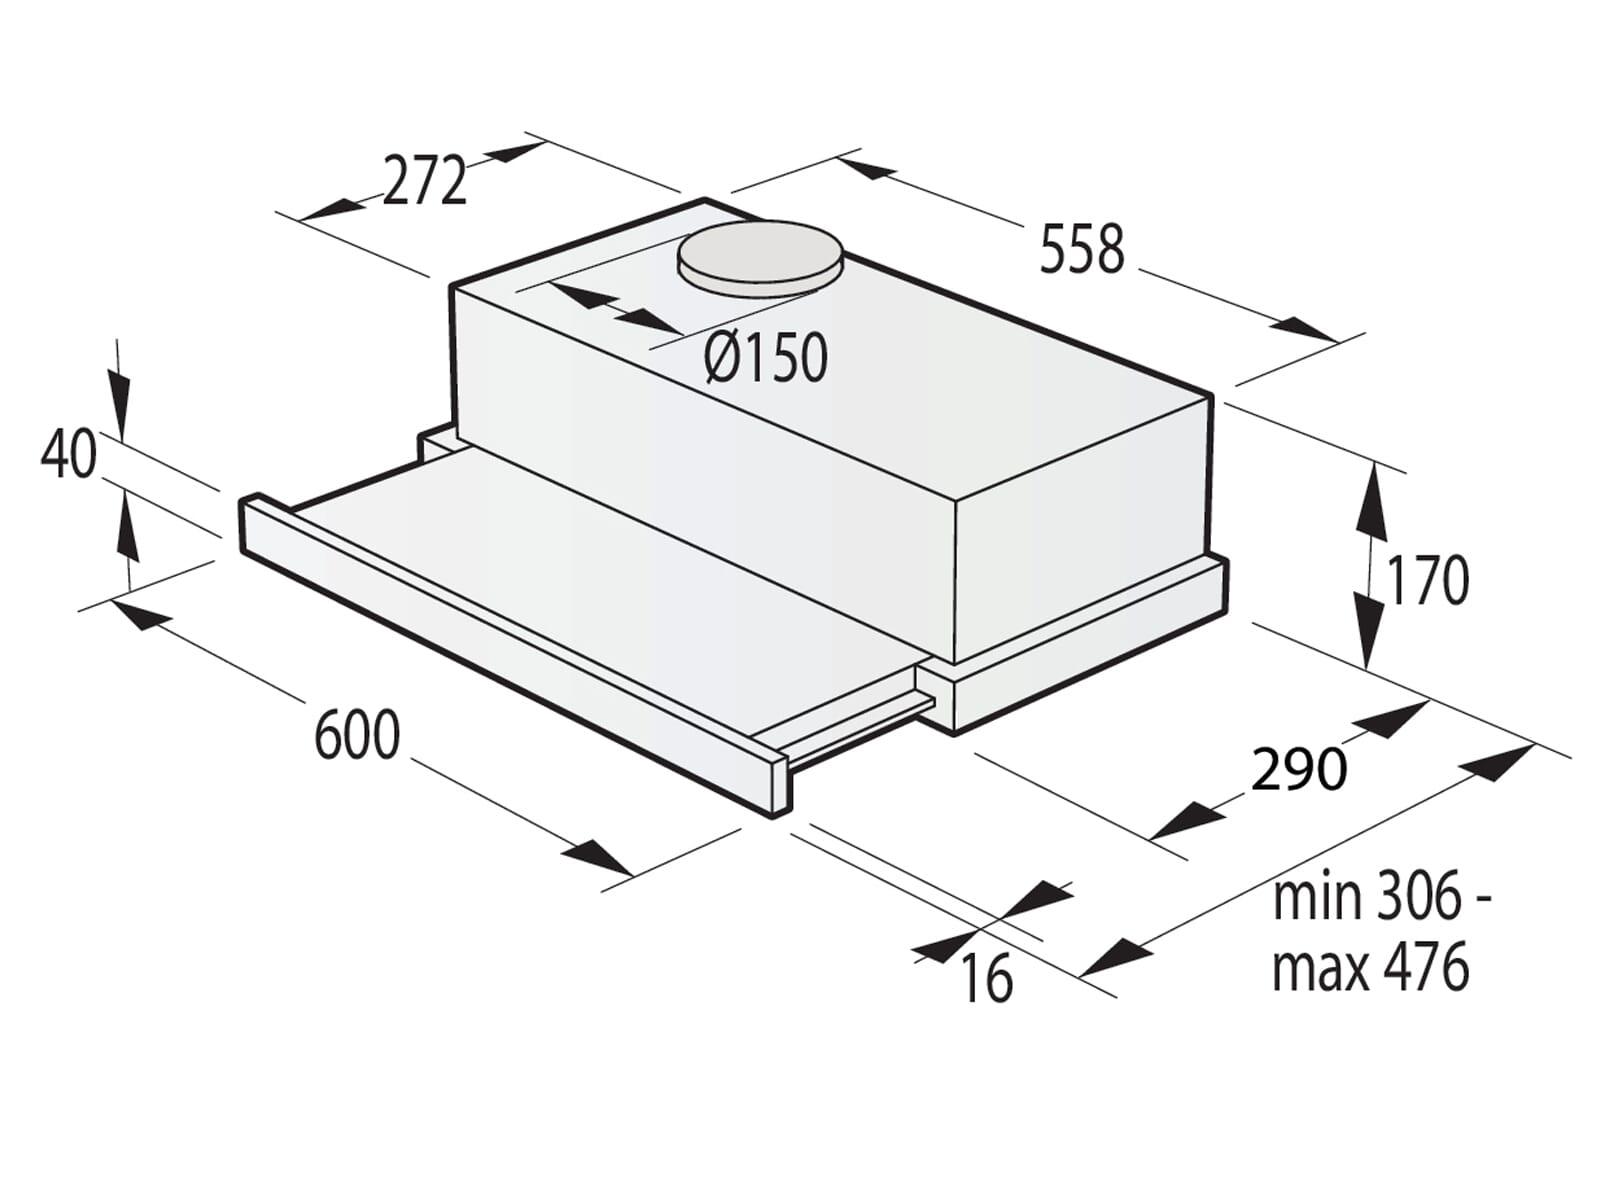 Gorenje TH62E4BG Flachschirm-Dunstabzugshaube 60 cm Schwarz